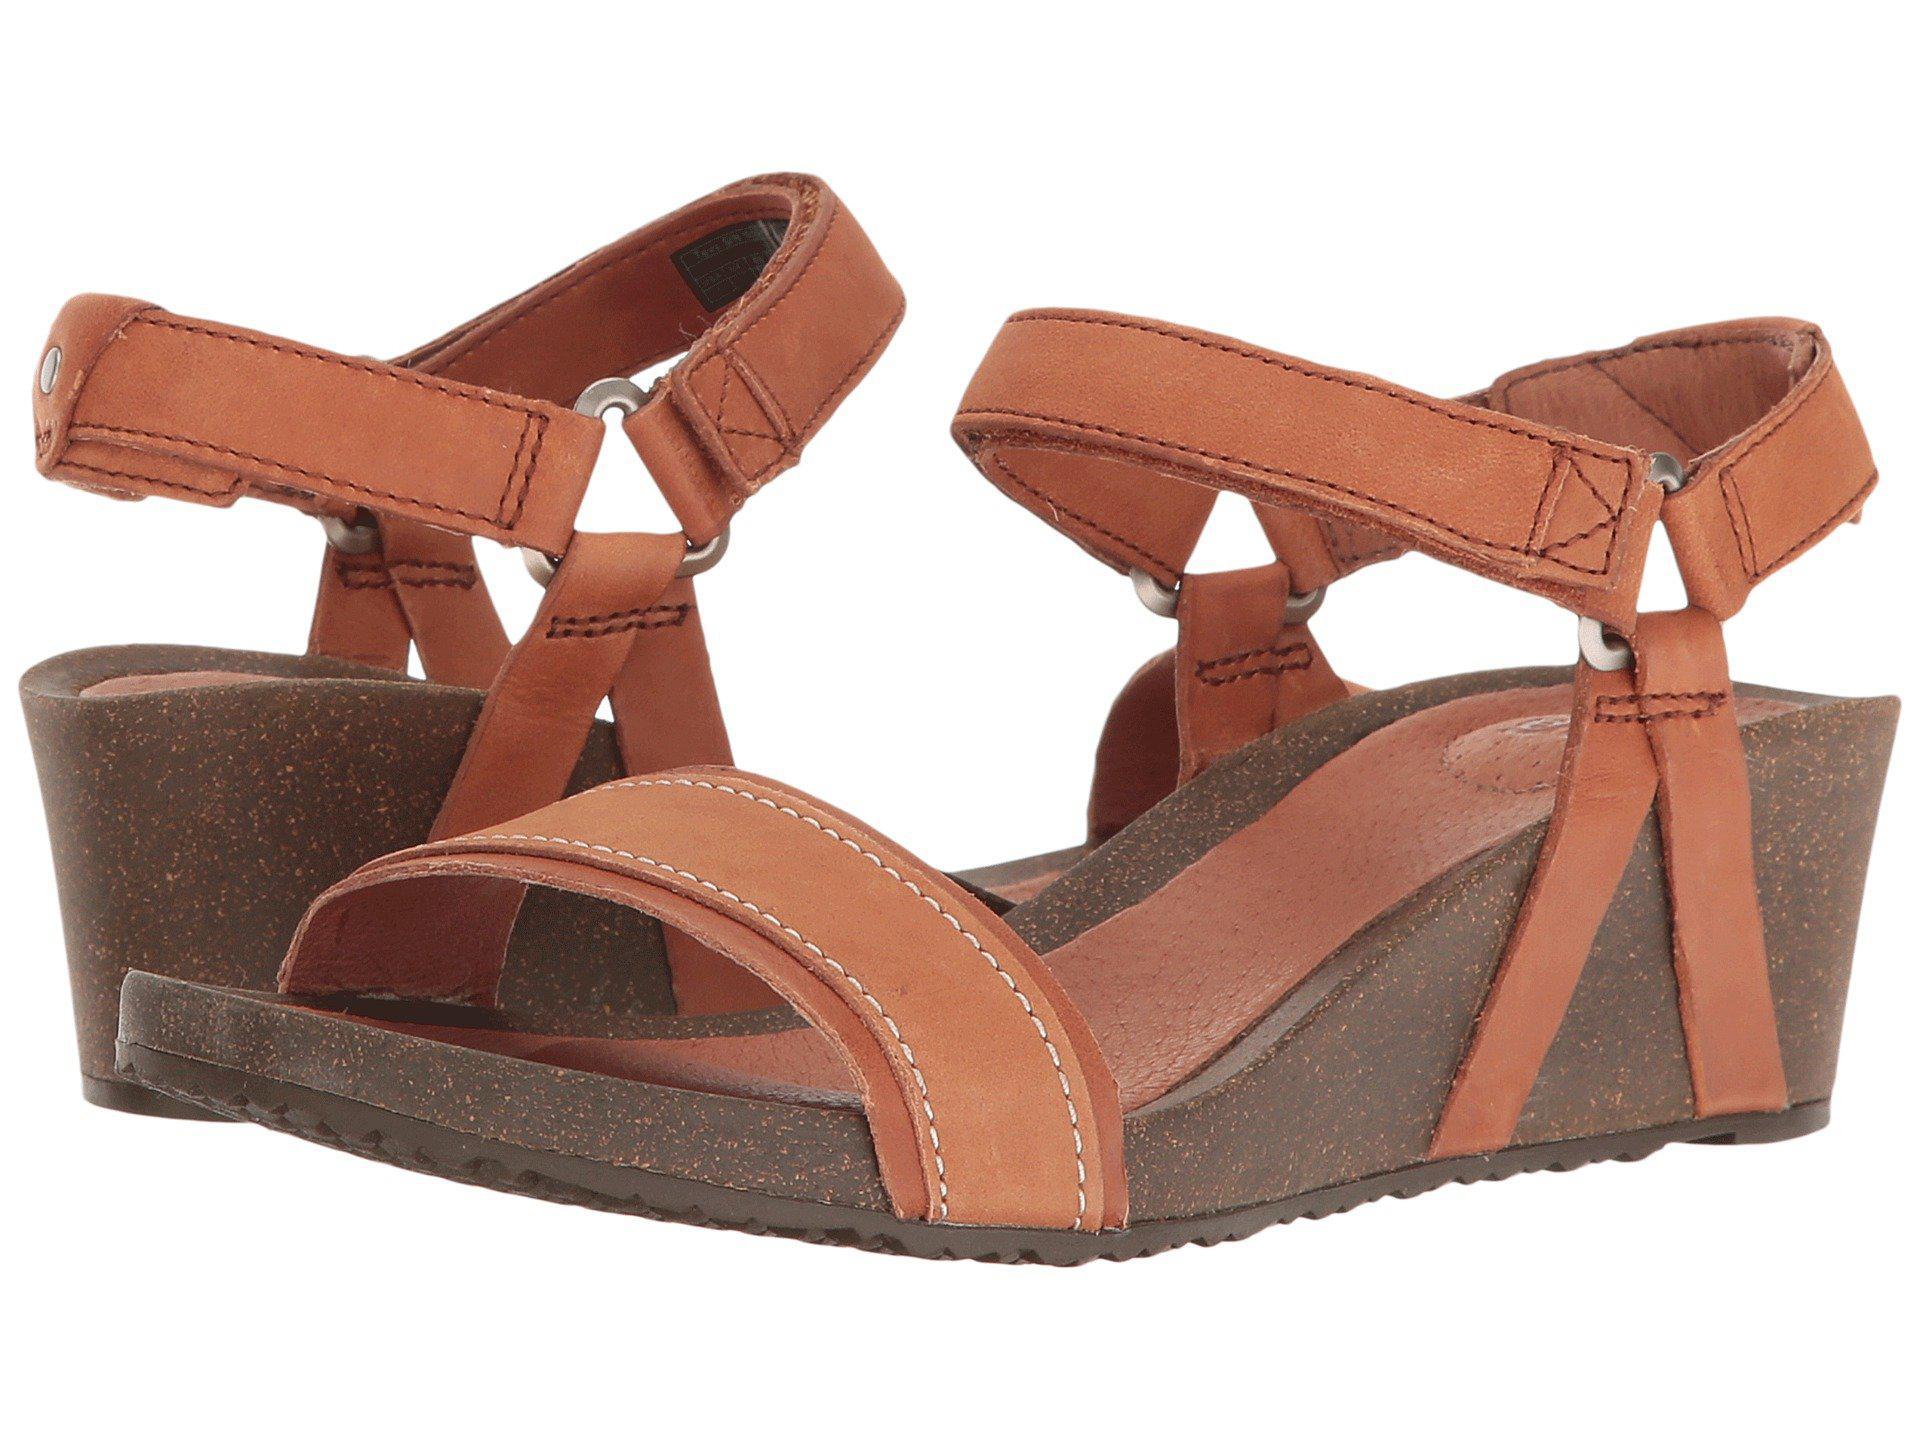 16f2e751f647 Lyst - Teva Ysidro Stitch Wedge (cognac) Women s Wedge Shoes in Brown